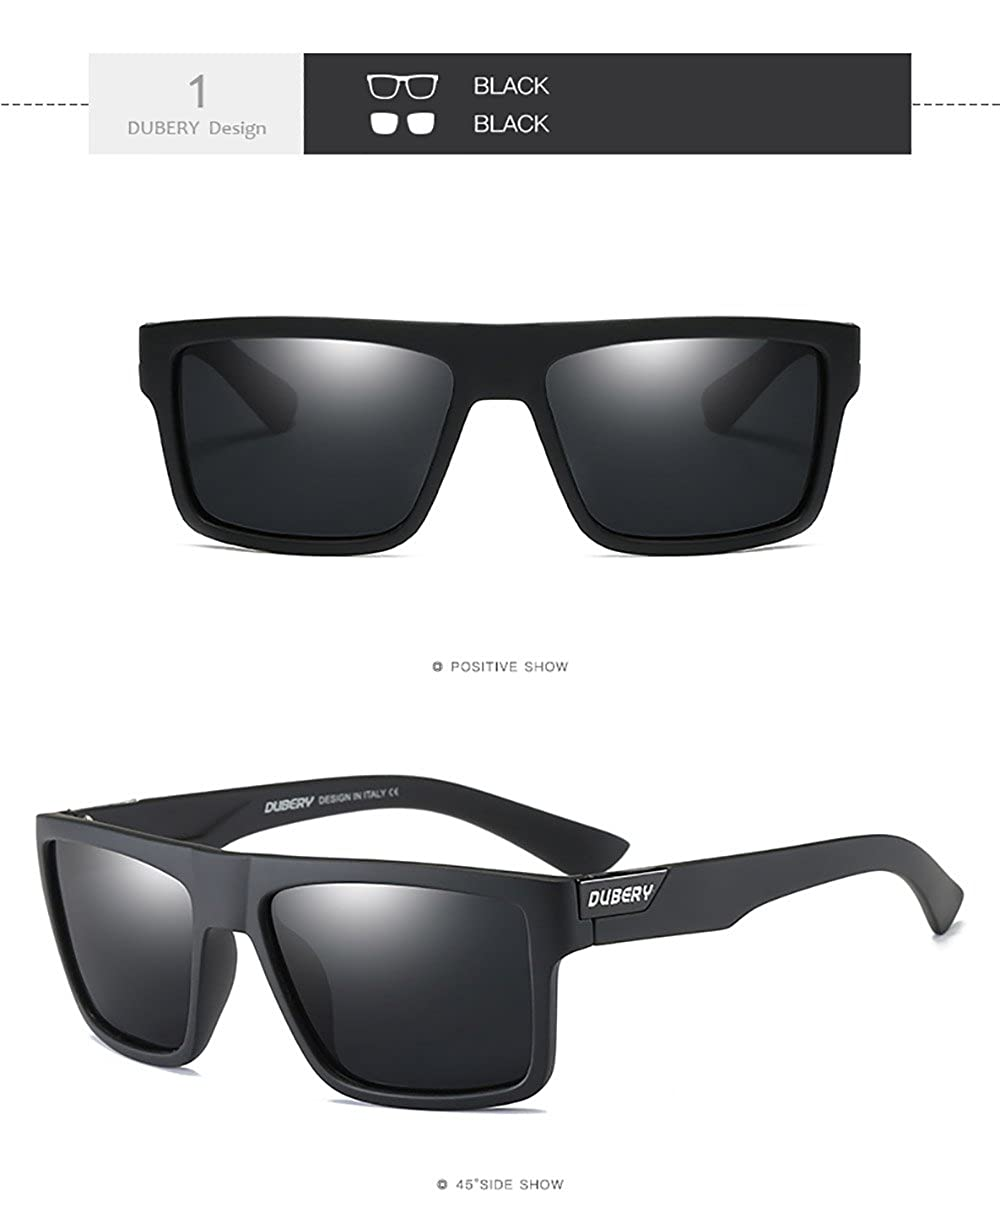 1bcc69194a Amazon.com  DUBERY Mens Sport Polarized Sunglasses Outdoor Riding Square  Windproof Eyewear ( 1)  Clothing